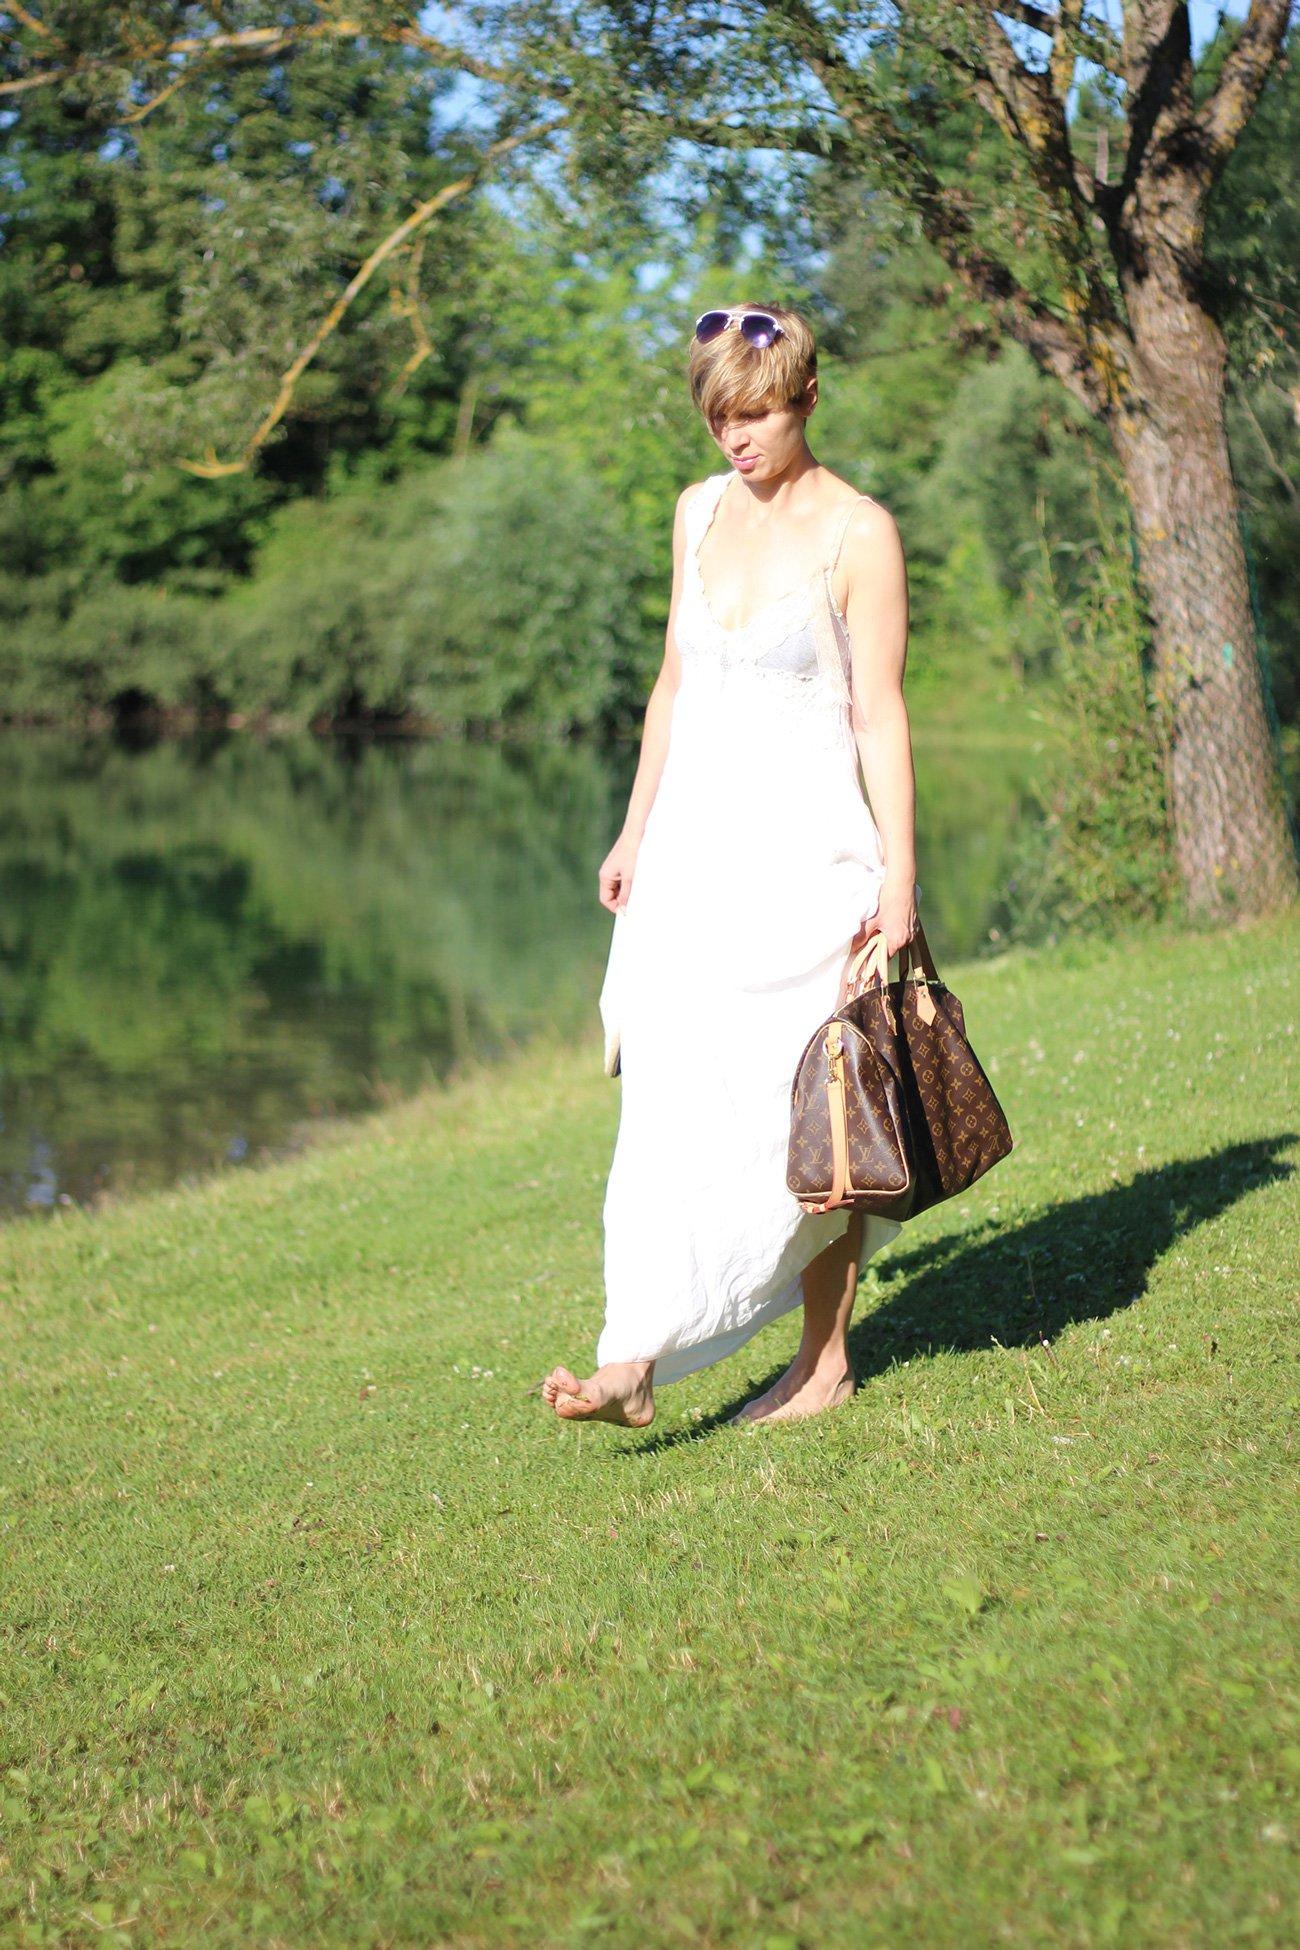 IMG_7206a_ElisaCavaletti_langes_Sommerkleid_summerdress